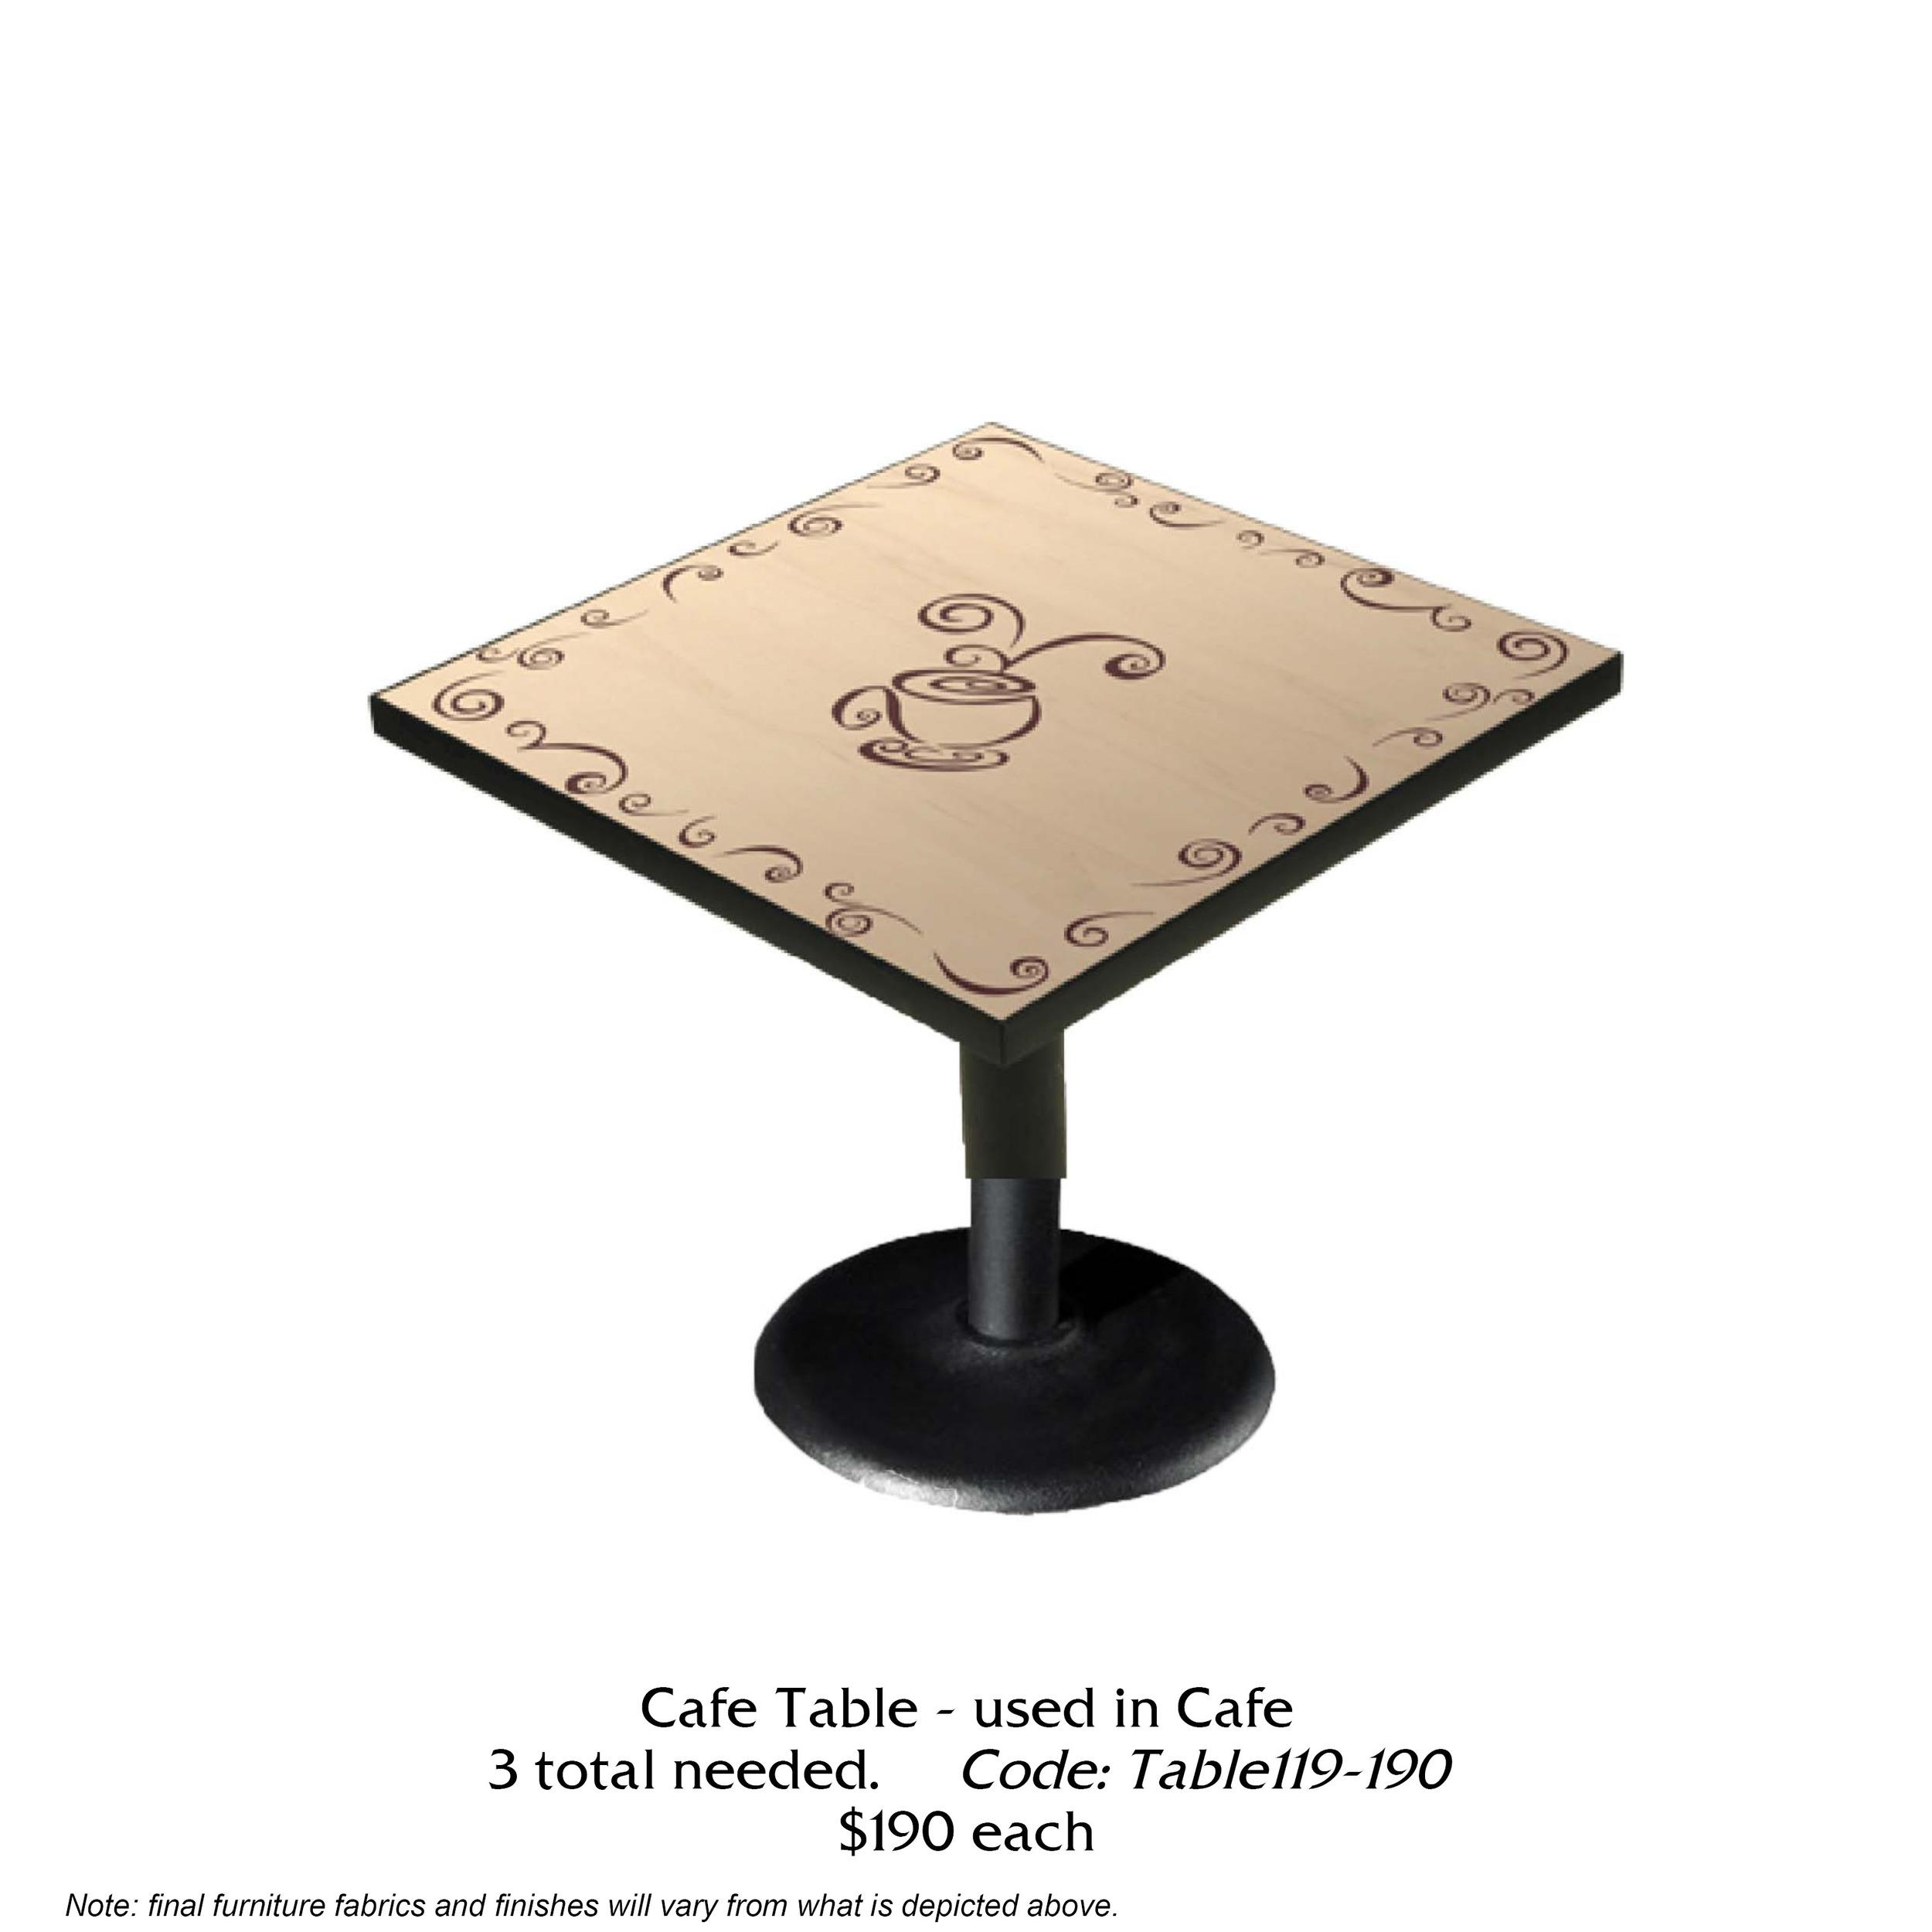 C109-F118-F119-Cafe Table - 3-3.jpg